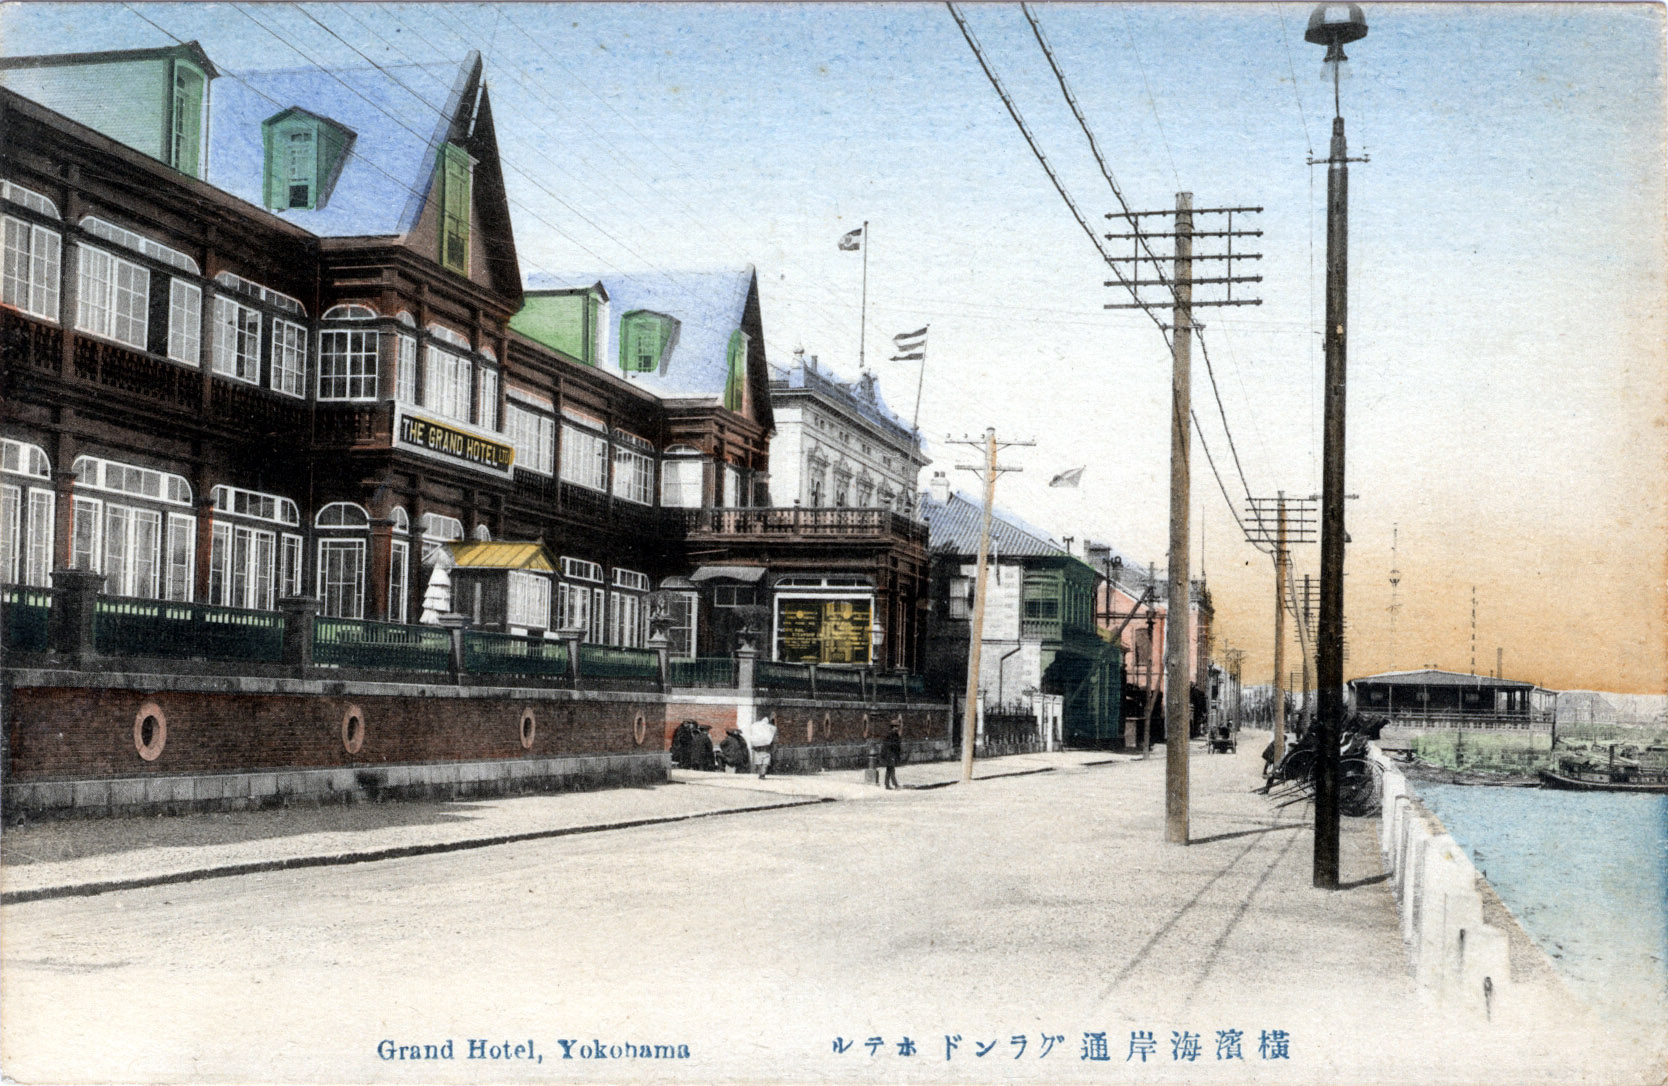 Grand Hotel, Yokohama, c. 1910. | Old Tokyo